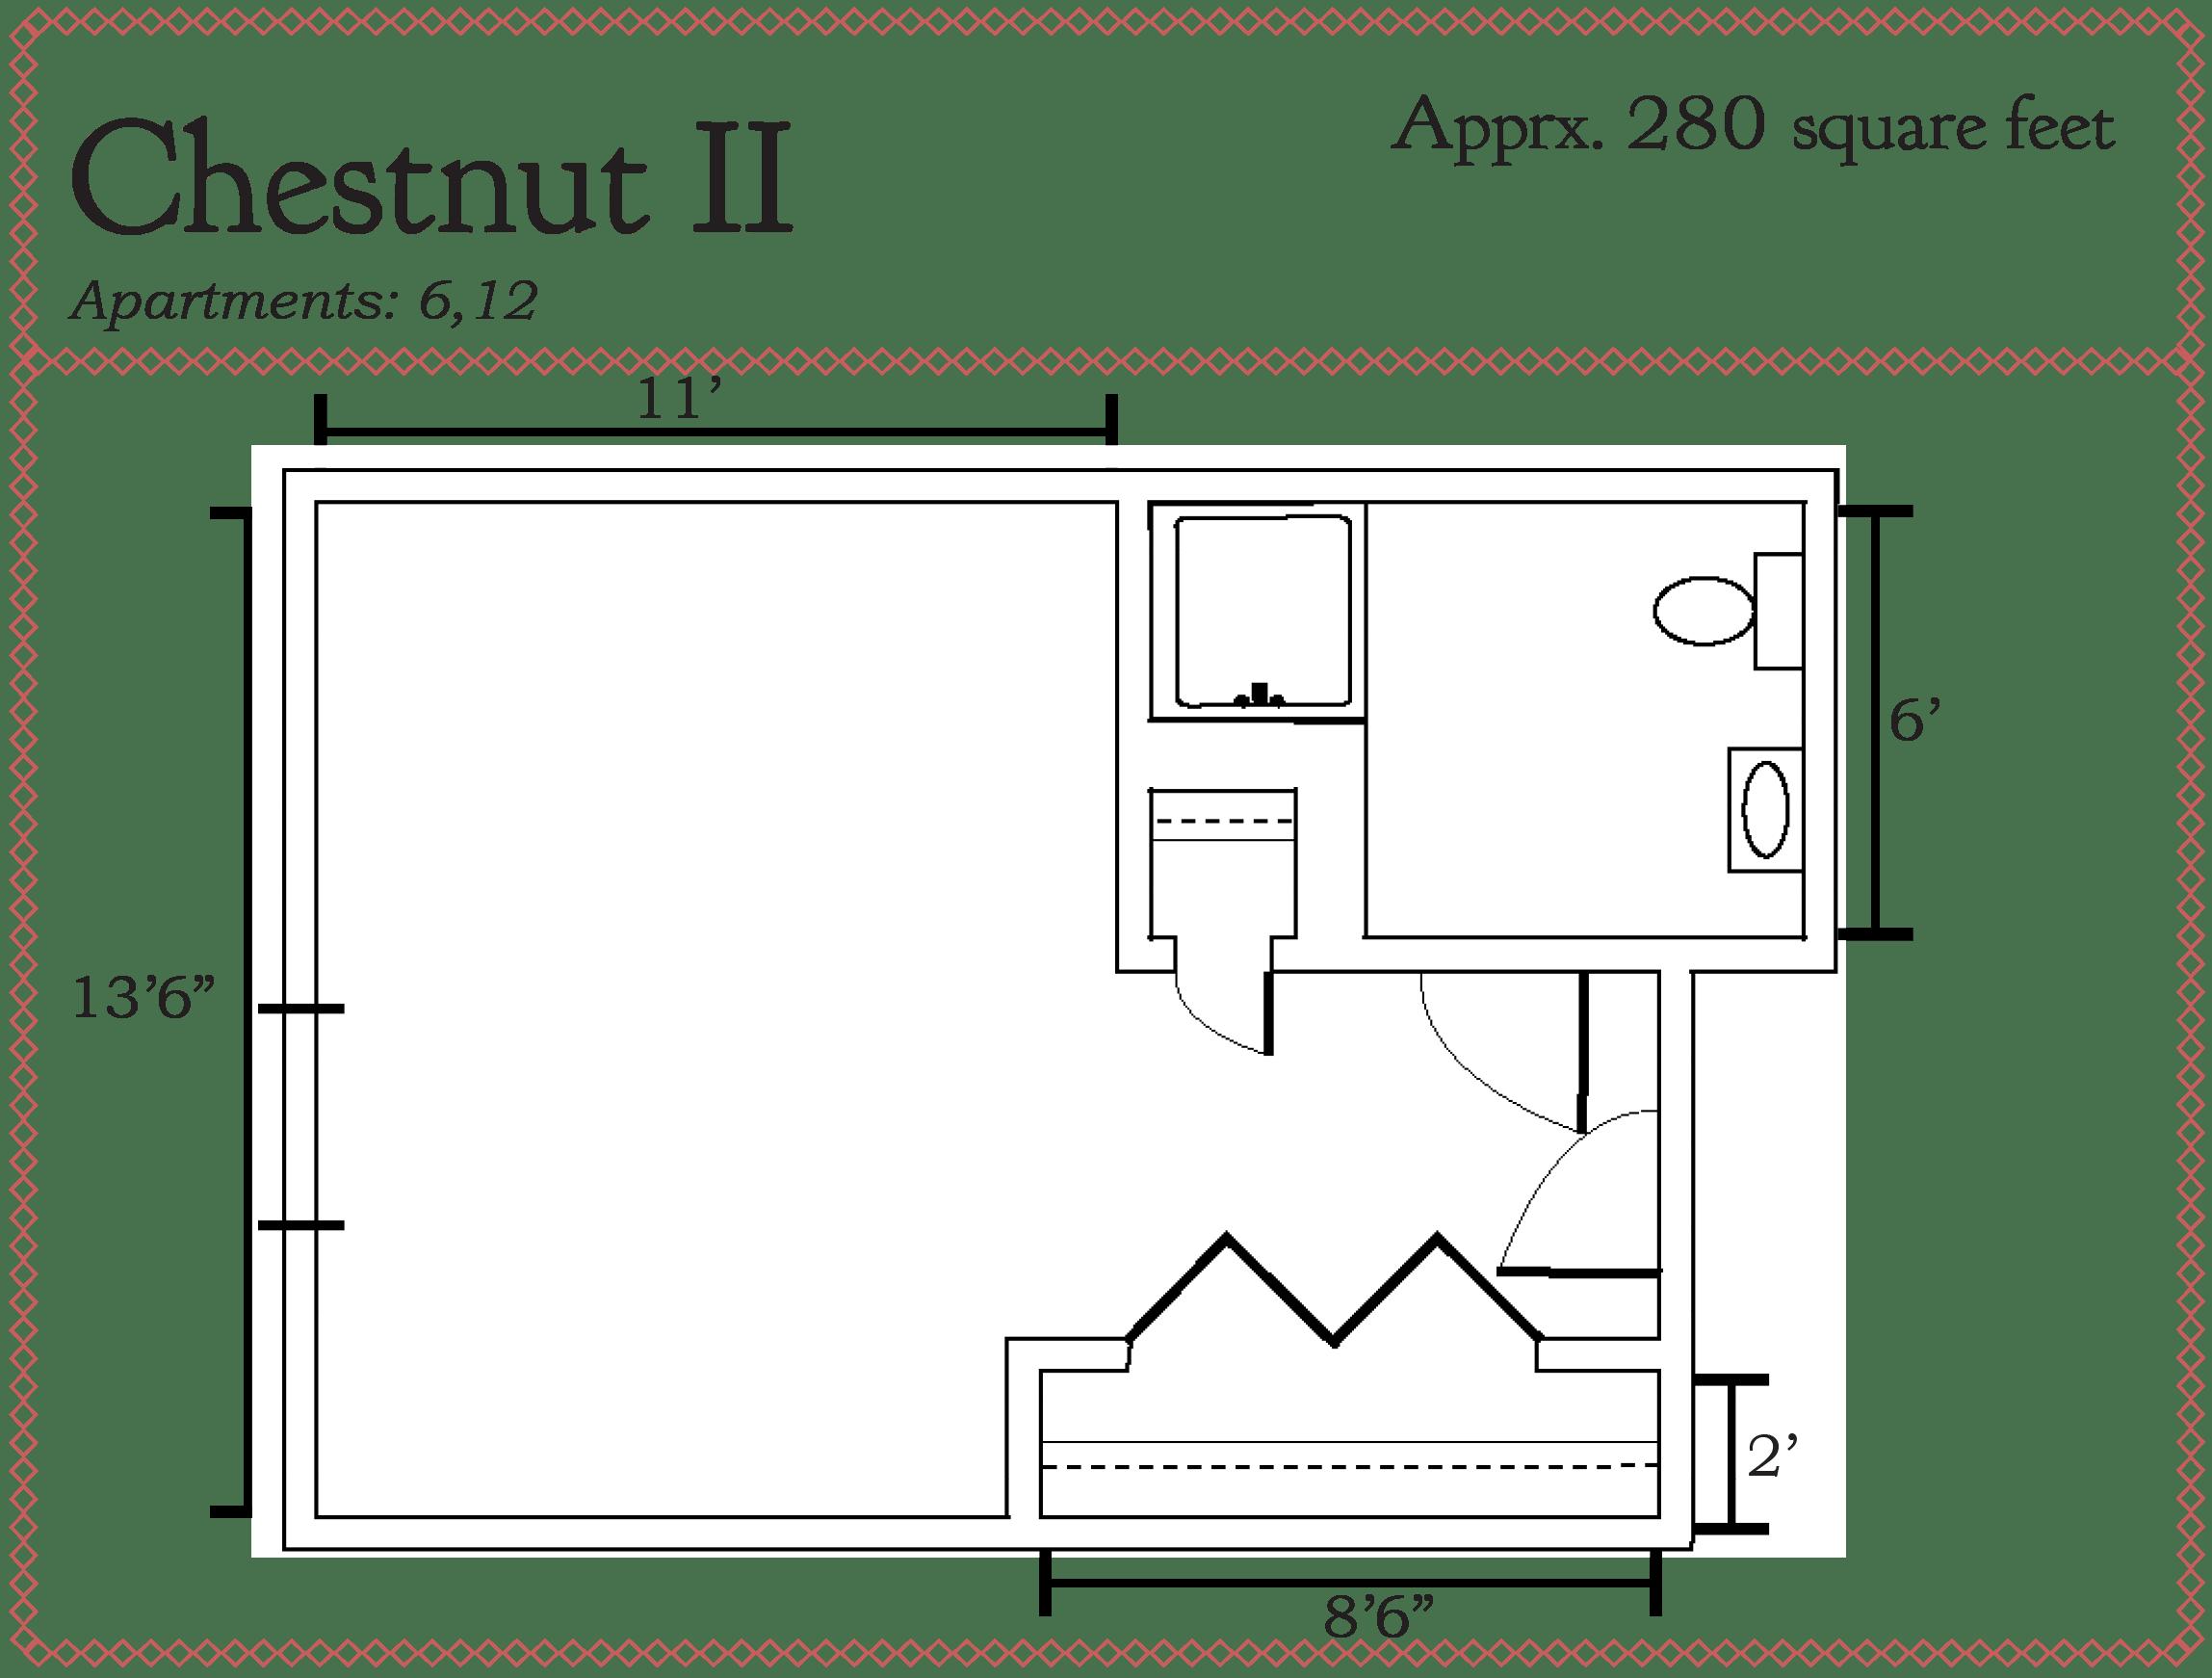 Chestnut II